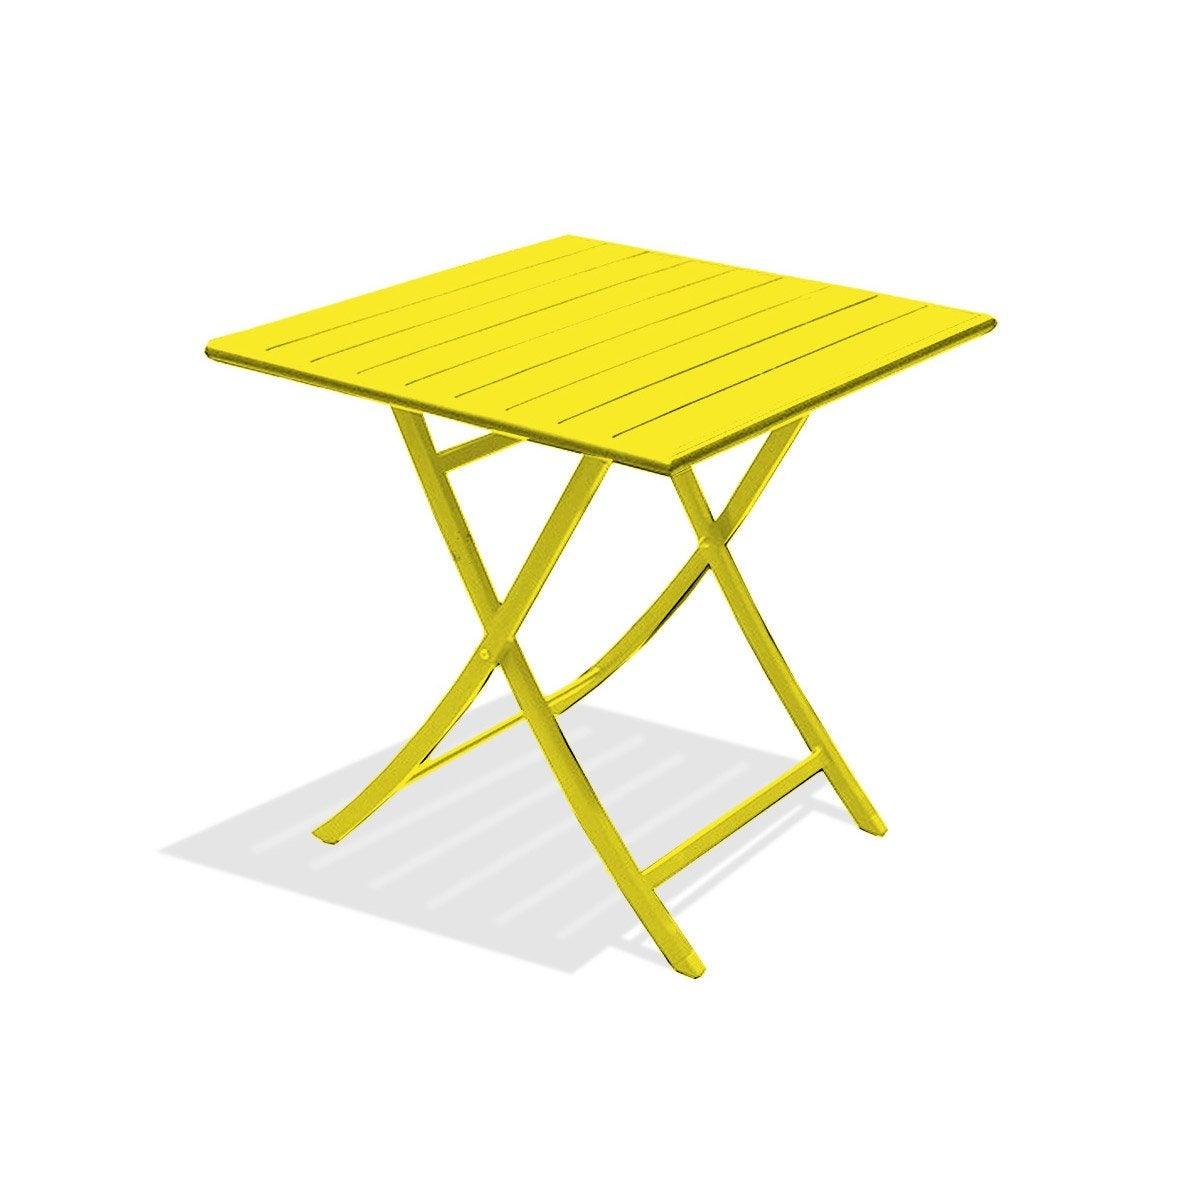 Table de jardin Marius carrée jaune zinc 2 personnes | Leroy Merlin